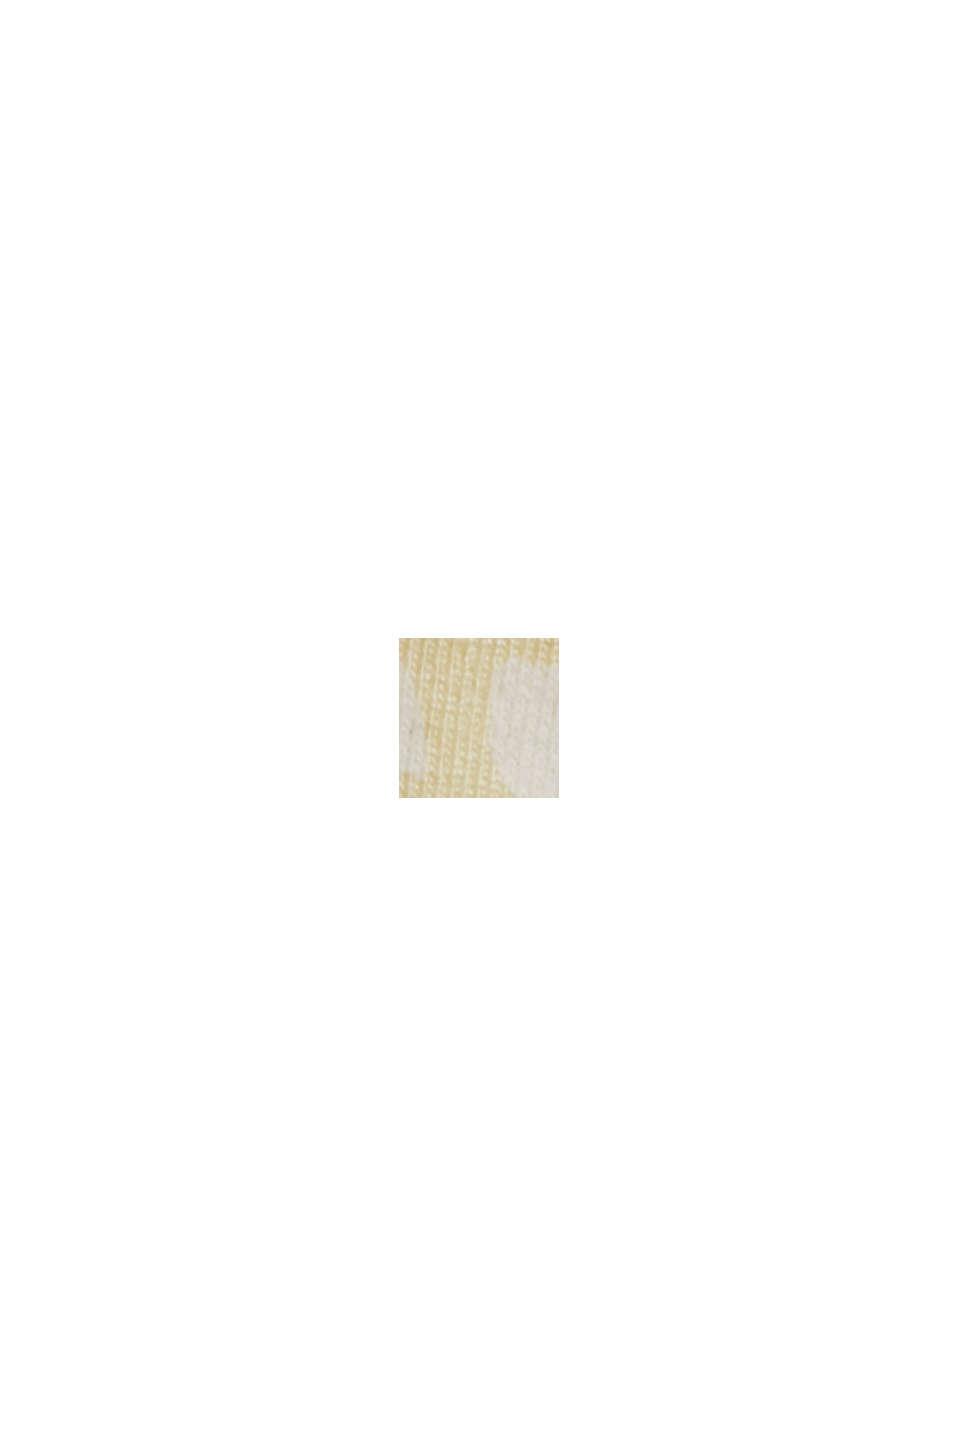 Printed spaghetti strap top, LENZING™ ECOVERO™, LIGHT YELLOW, swatch